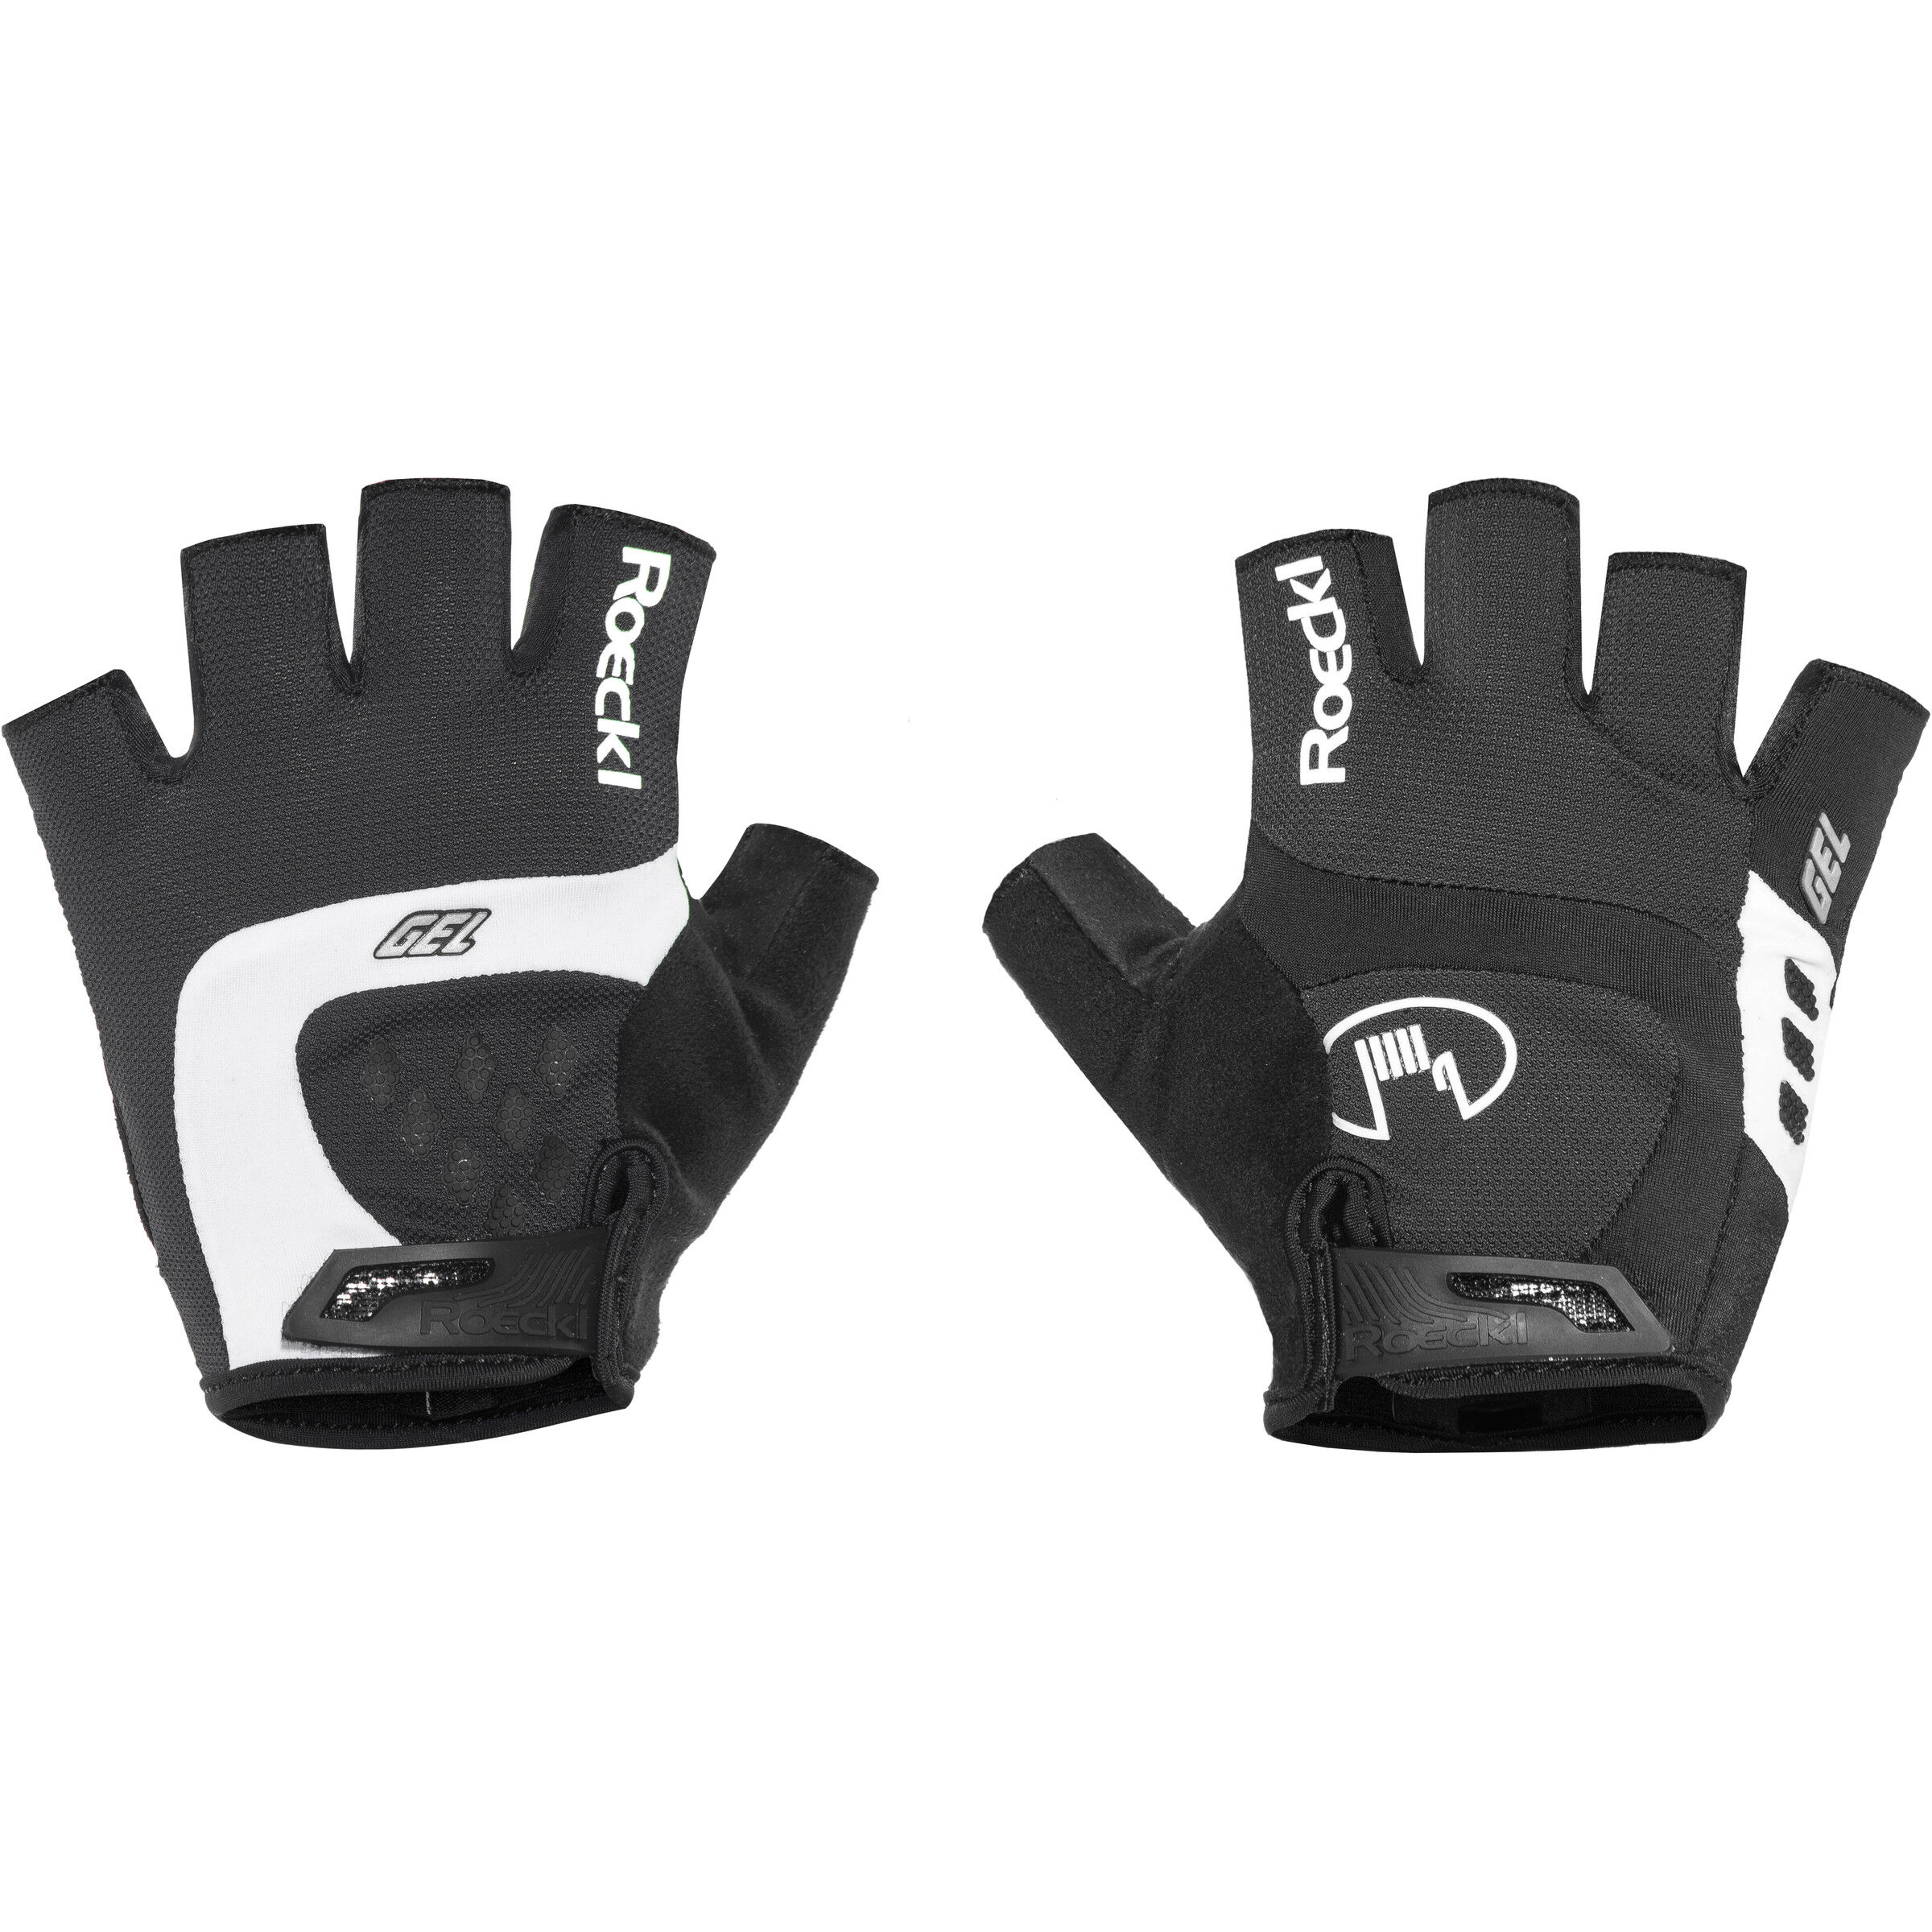 Roeckl Ivory Handschuhe weißschwarz 6 2019 Mtb Handschuhe